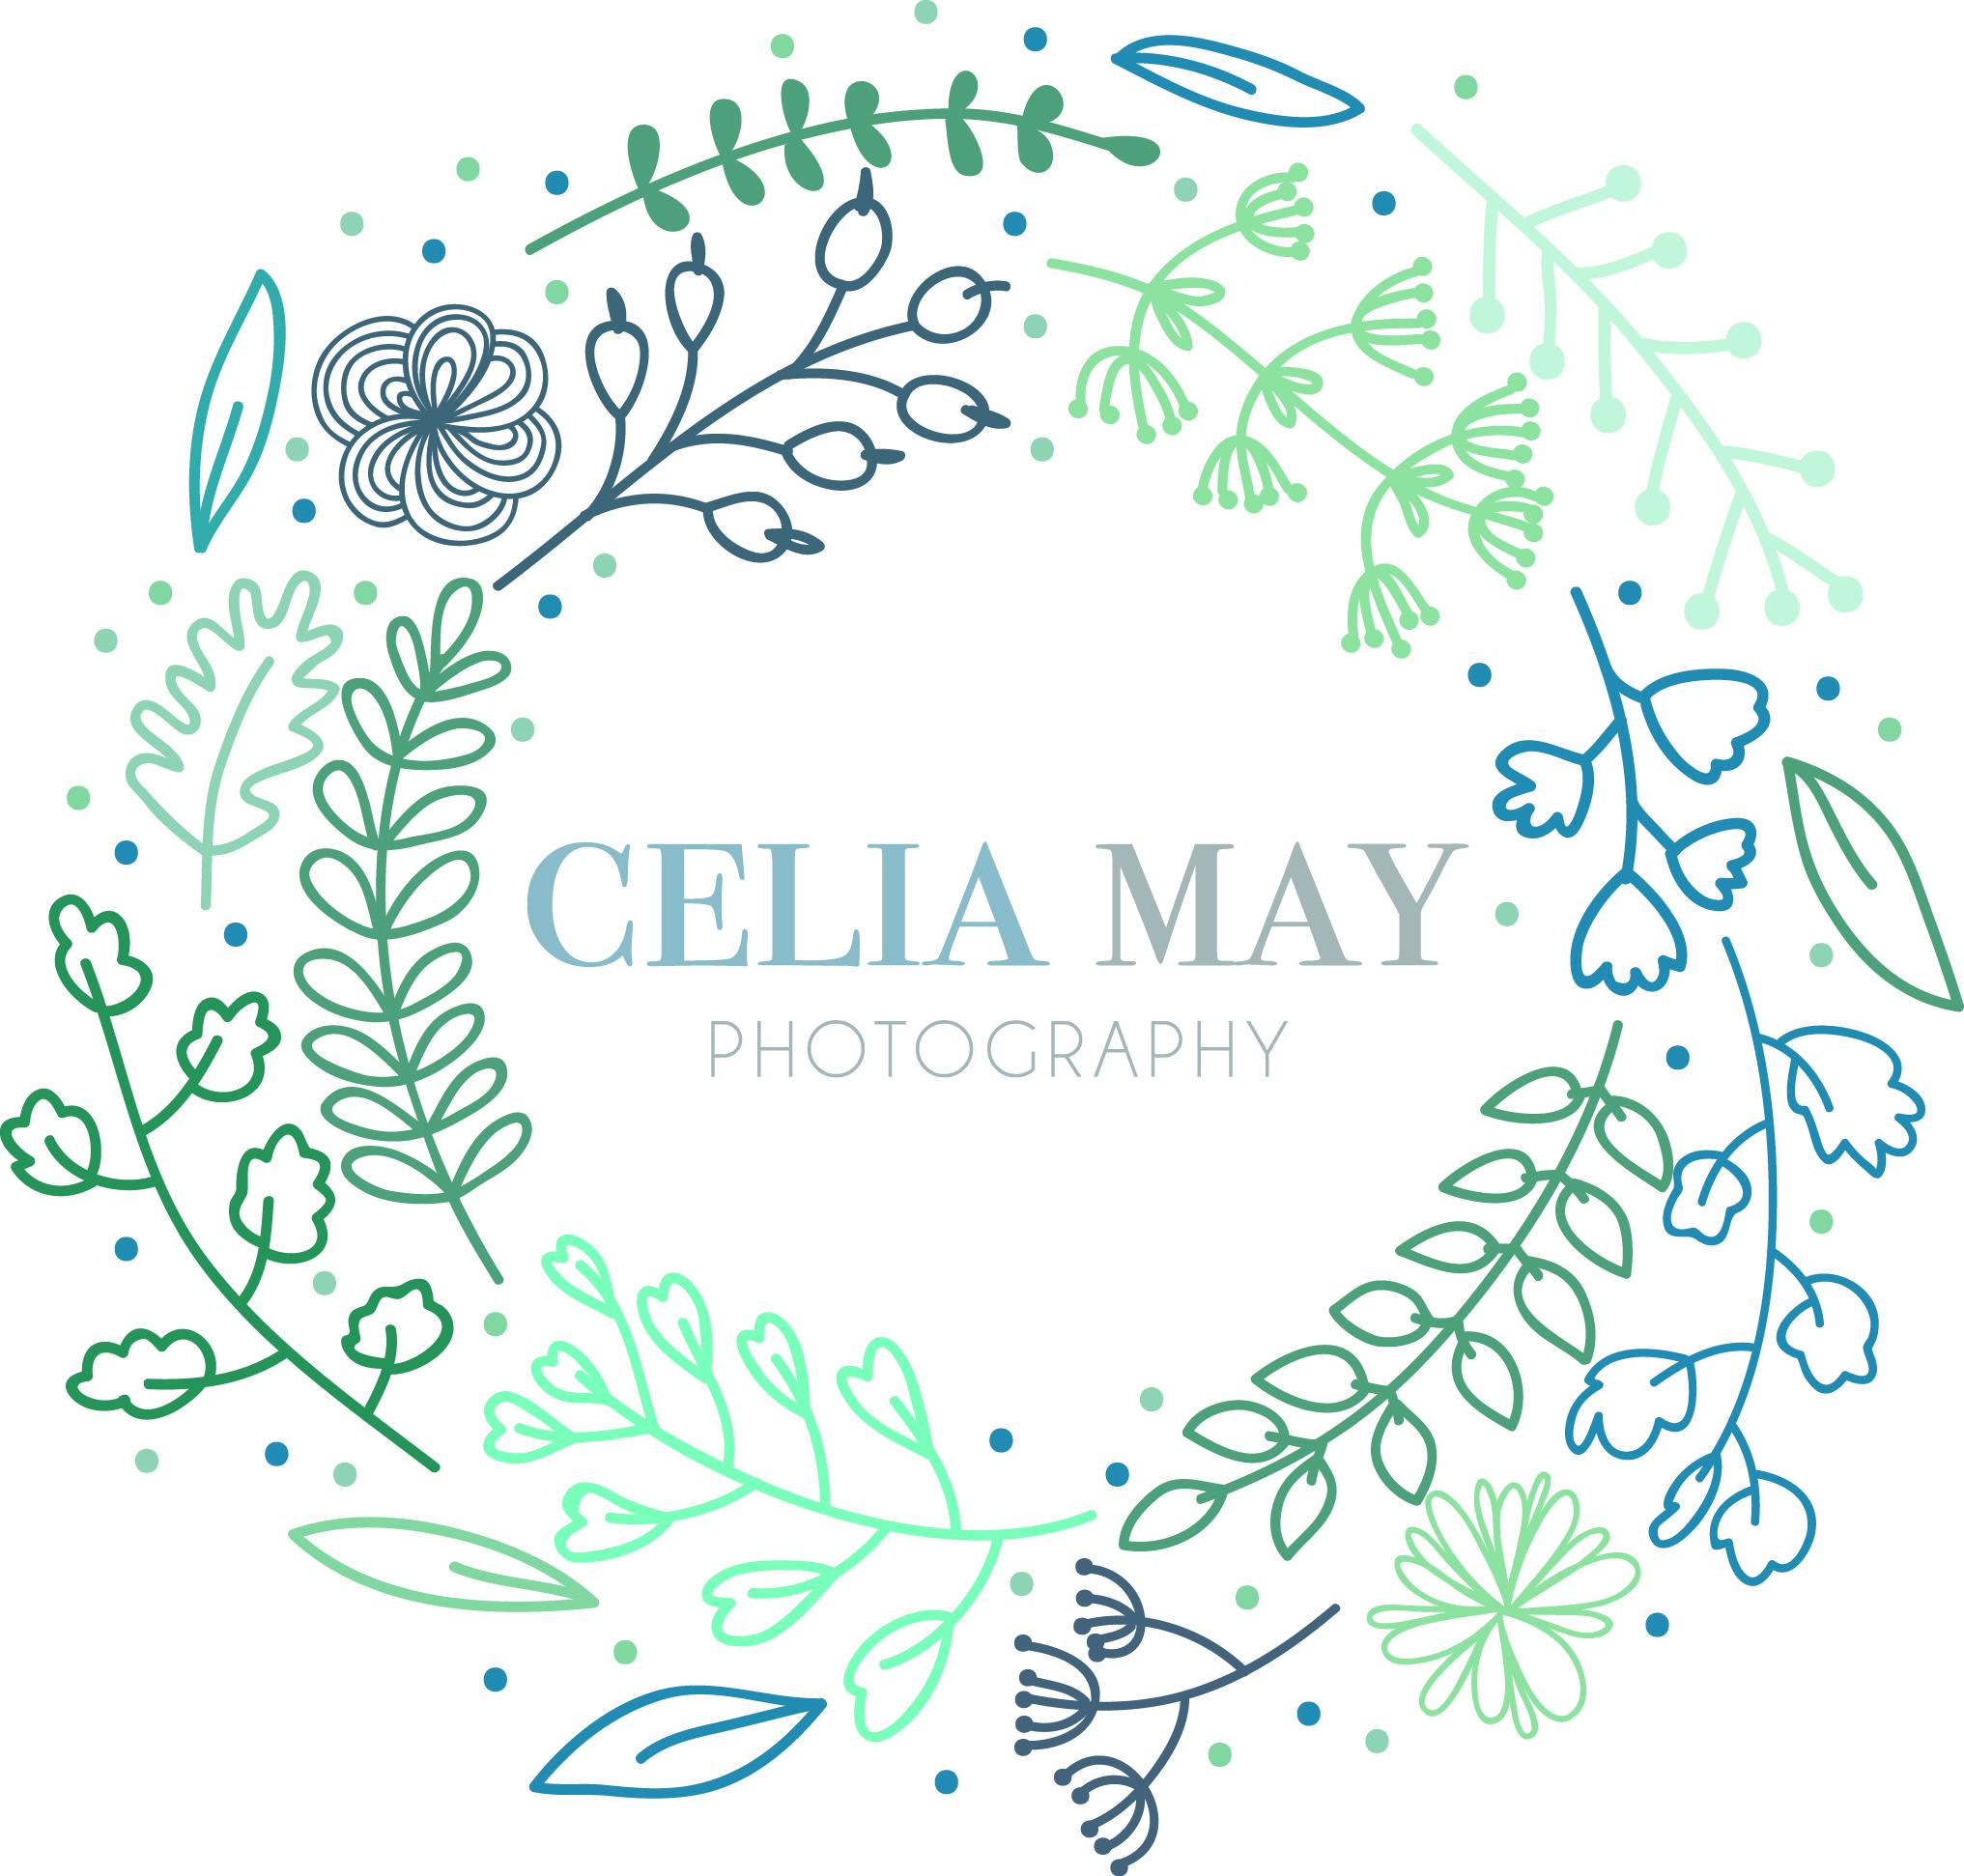 Celia May Photography